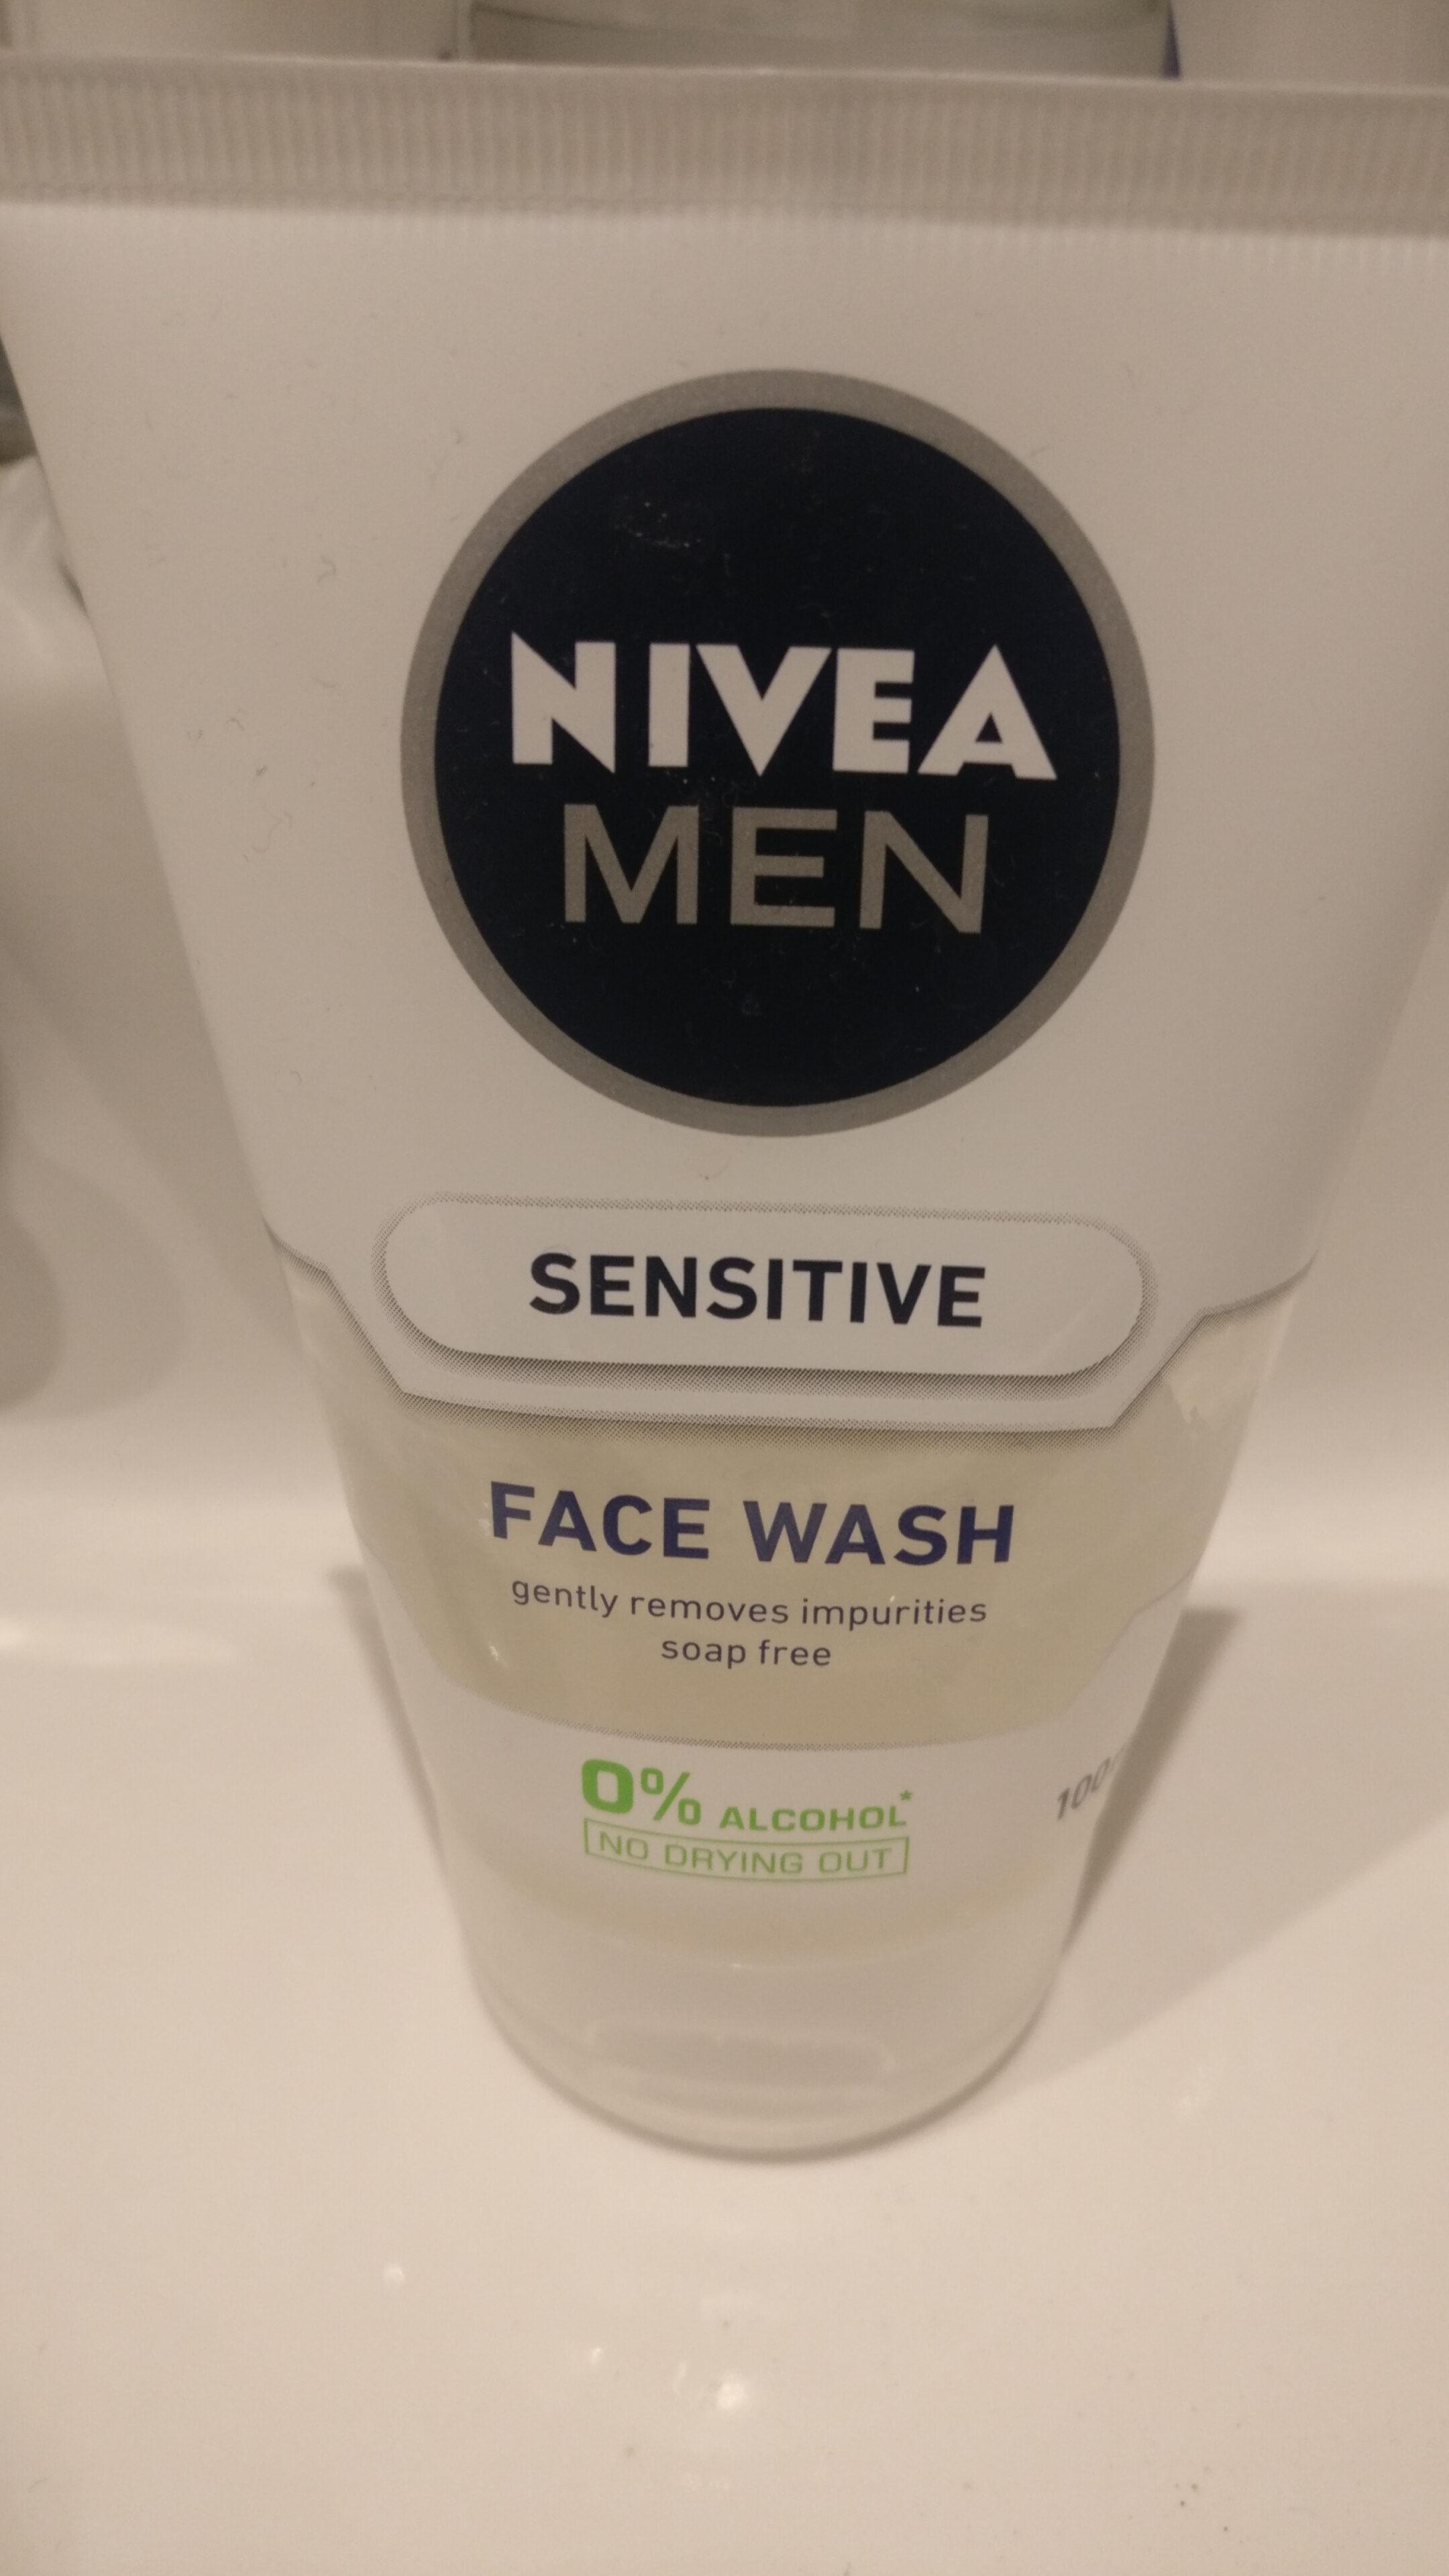 Nivea Men Sensitive Face Wash - Product - en